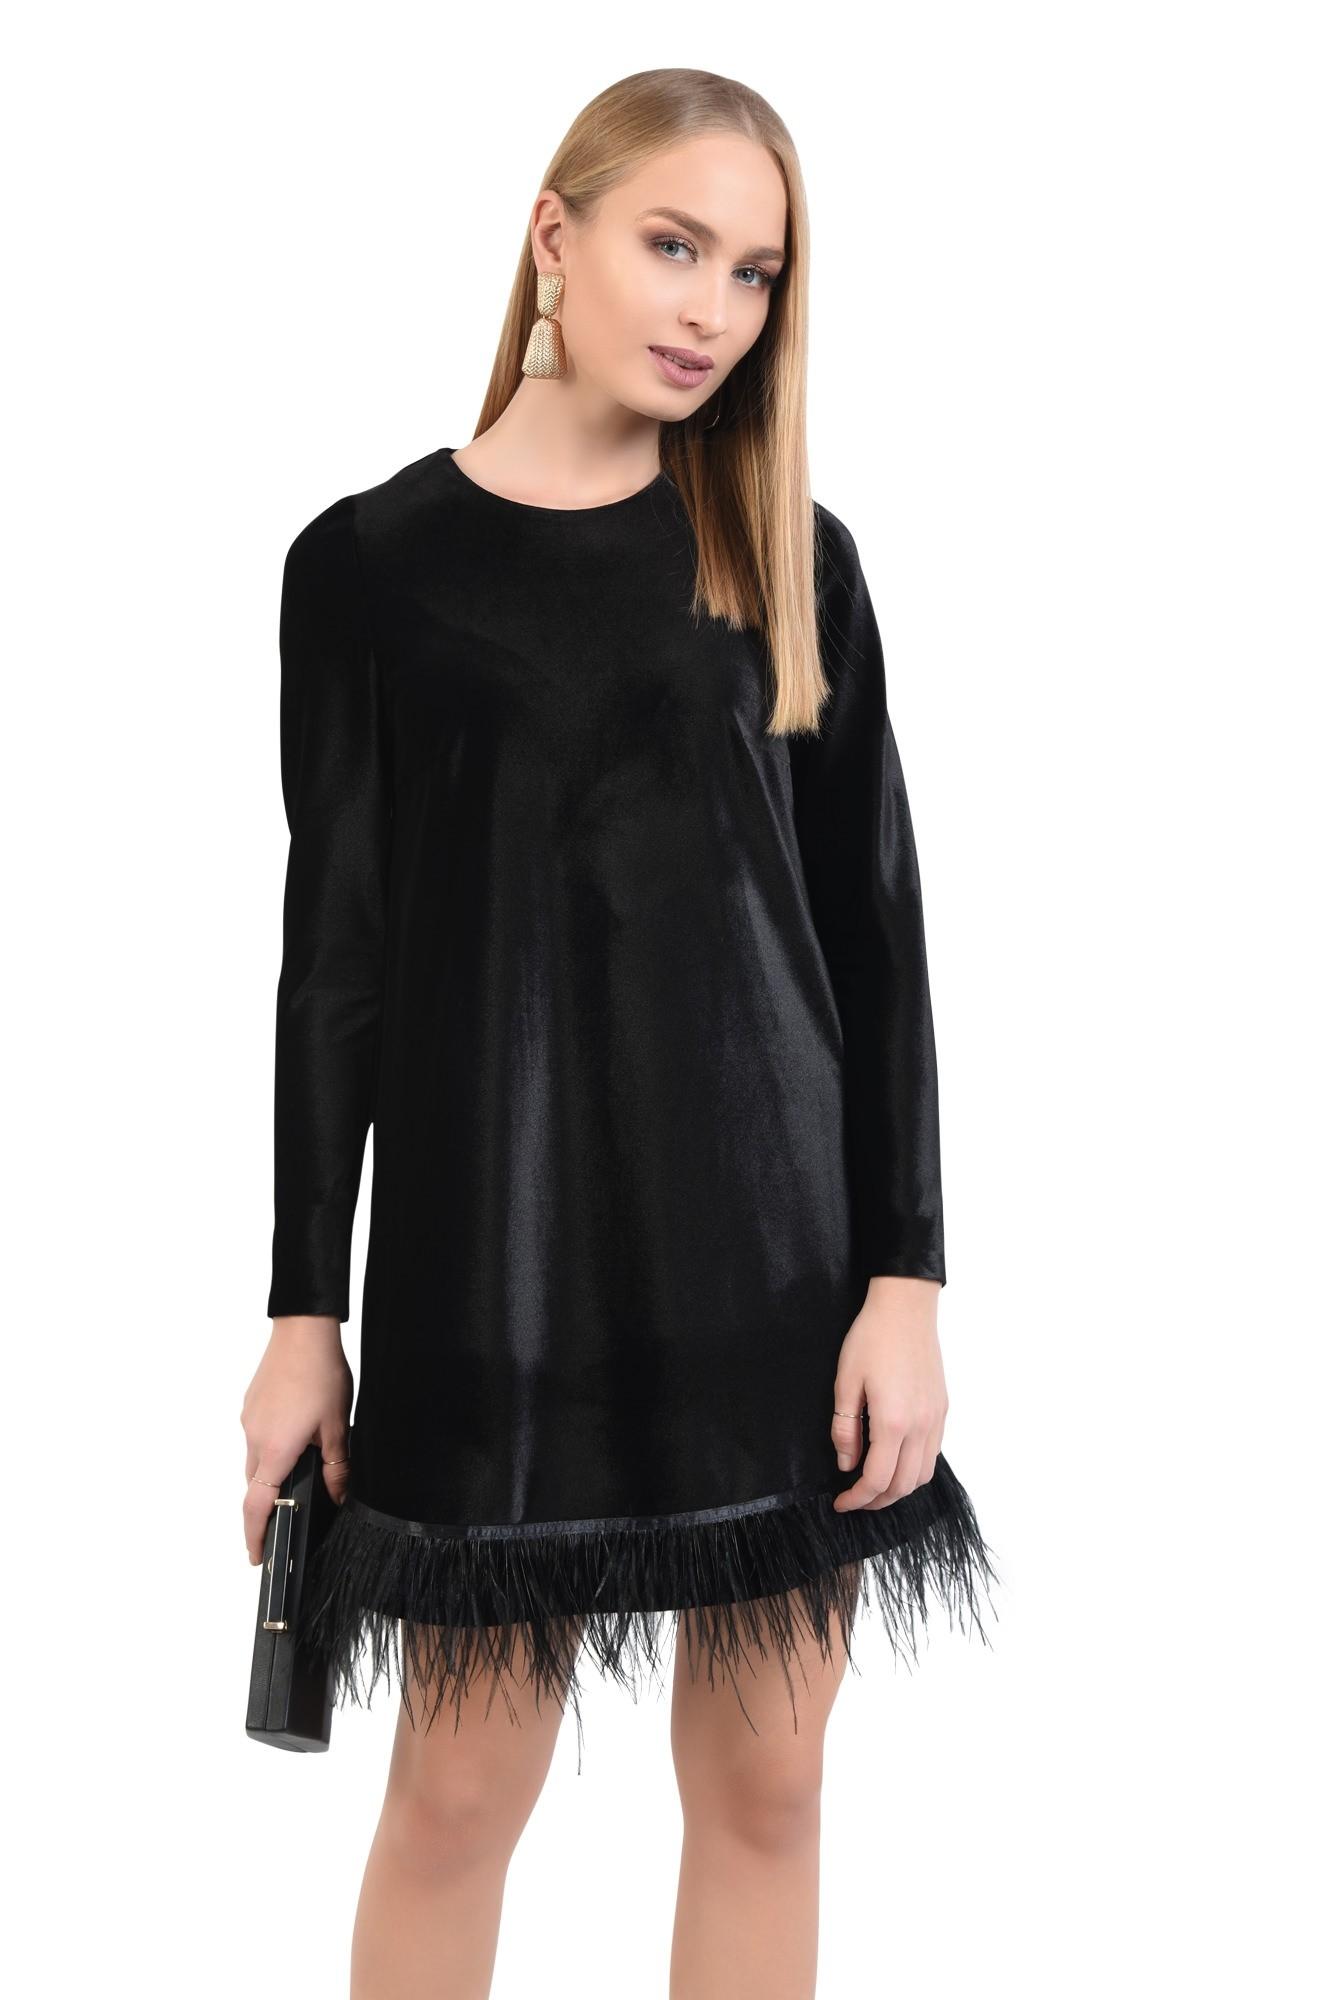 rochie de seara, neagra, scurta, croi drept lejer, bordura din pene